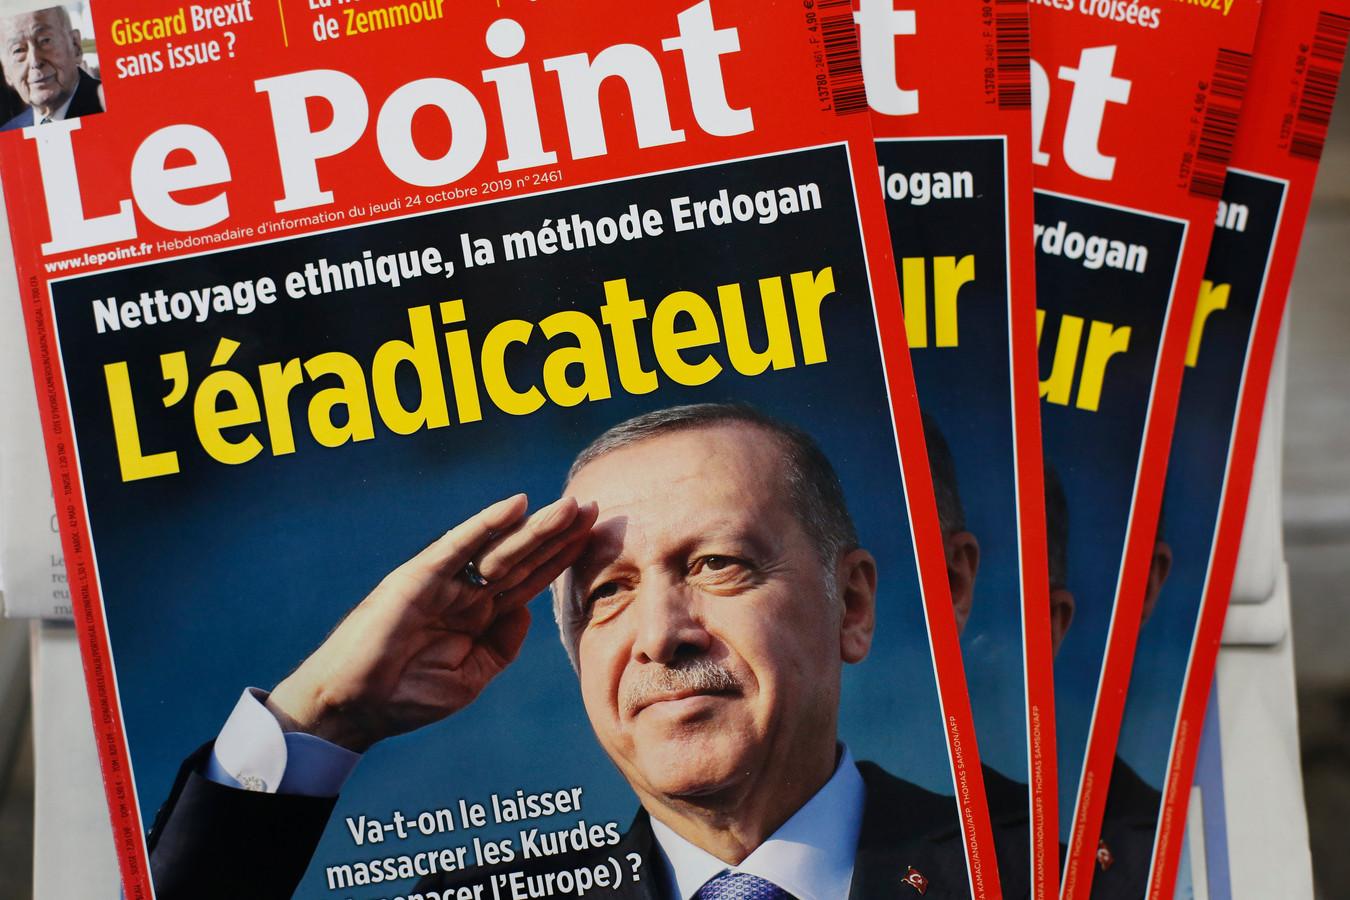 De cover van 'Le Point' spreekt boekdelen.